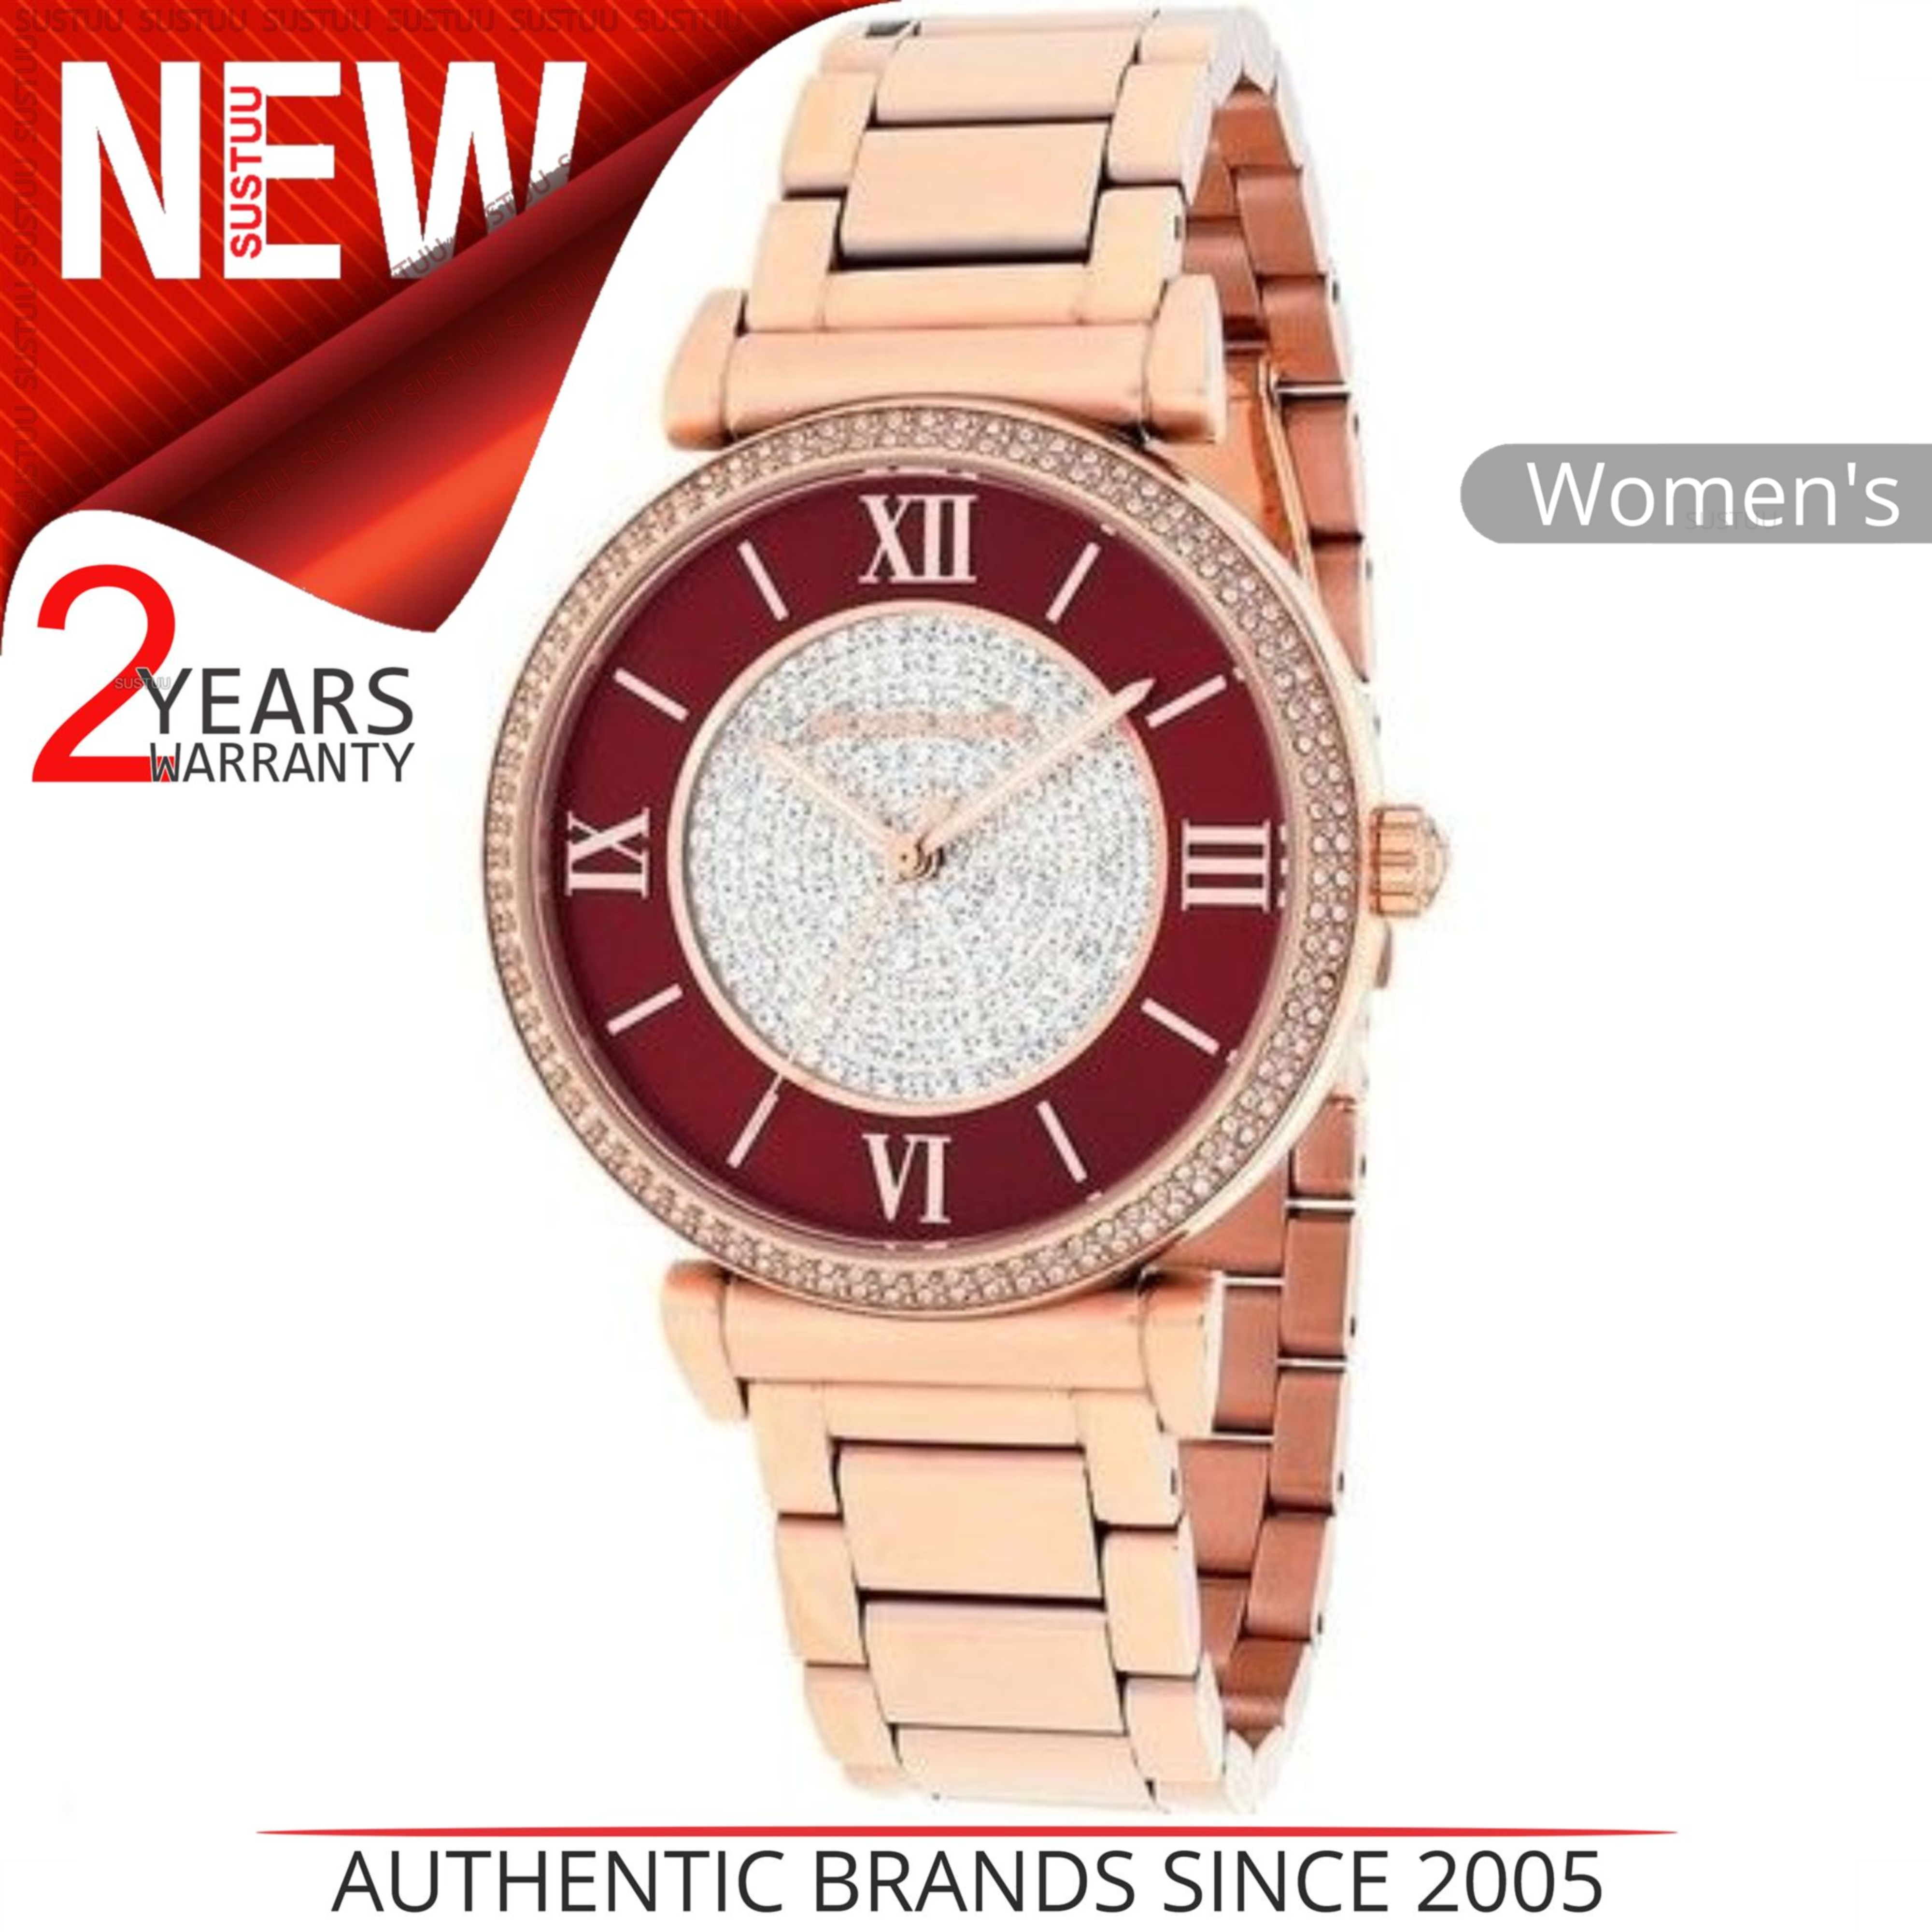 541d3915d6df7 Details about Michael Kors Caitlin Women Watch MK3377│Red Crystal Dial│Rose  Gold Bracelet Band